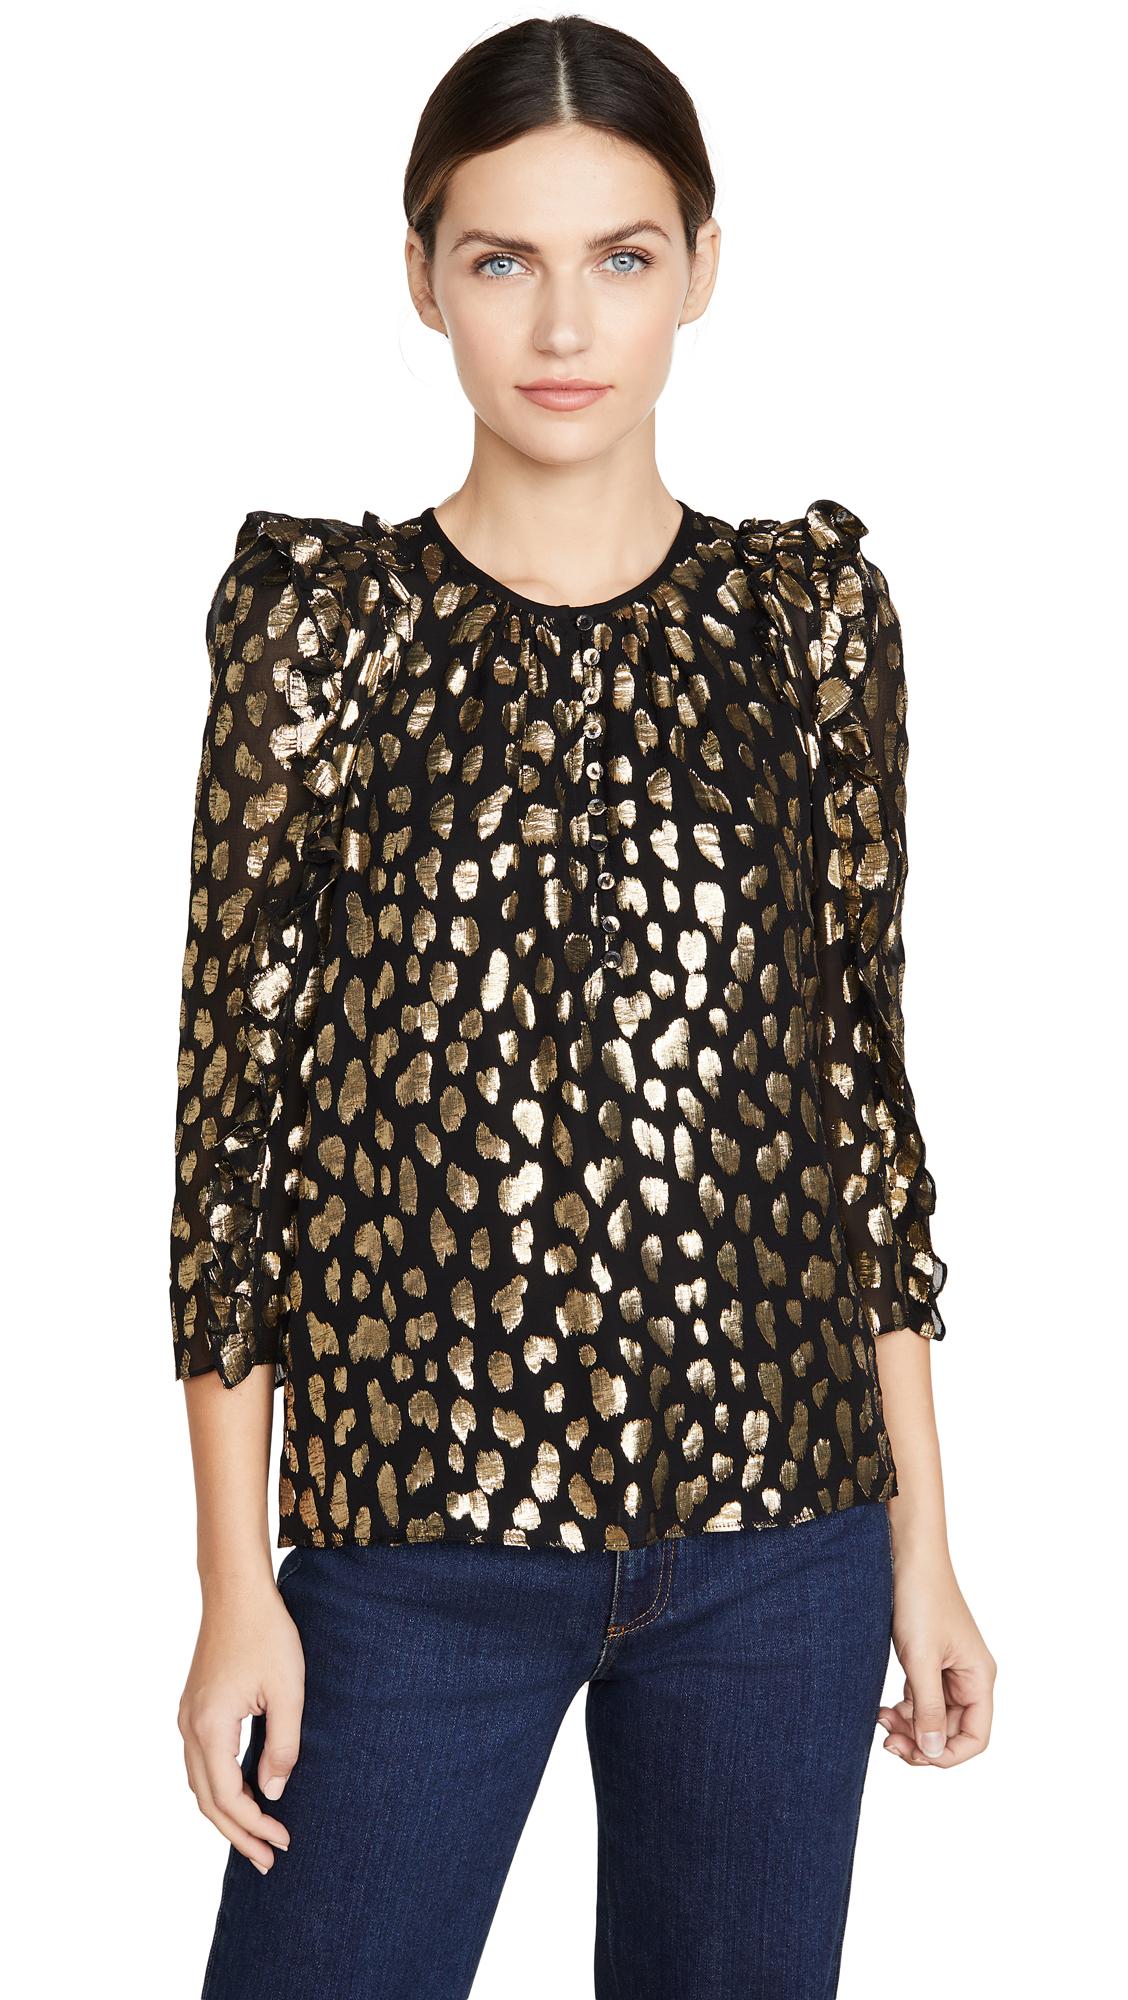 Rebecca Taylor Long Sleeve Leopard Metallic Top - 40% Off Sale